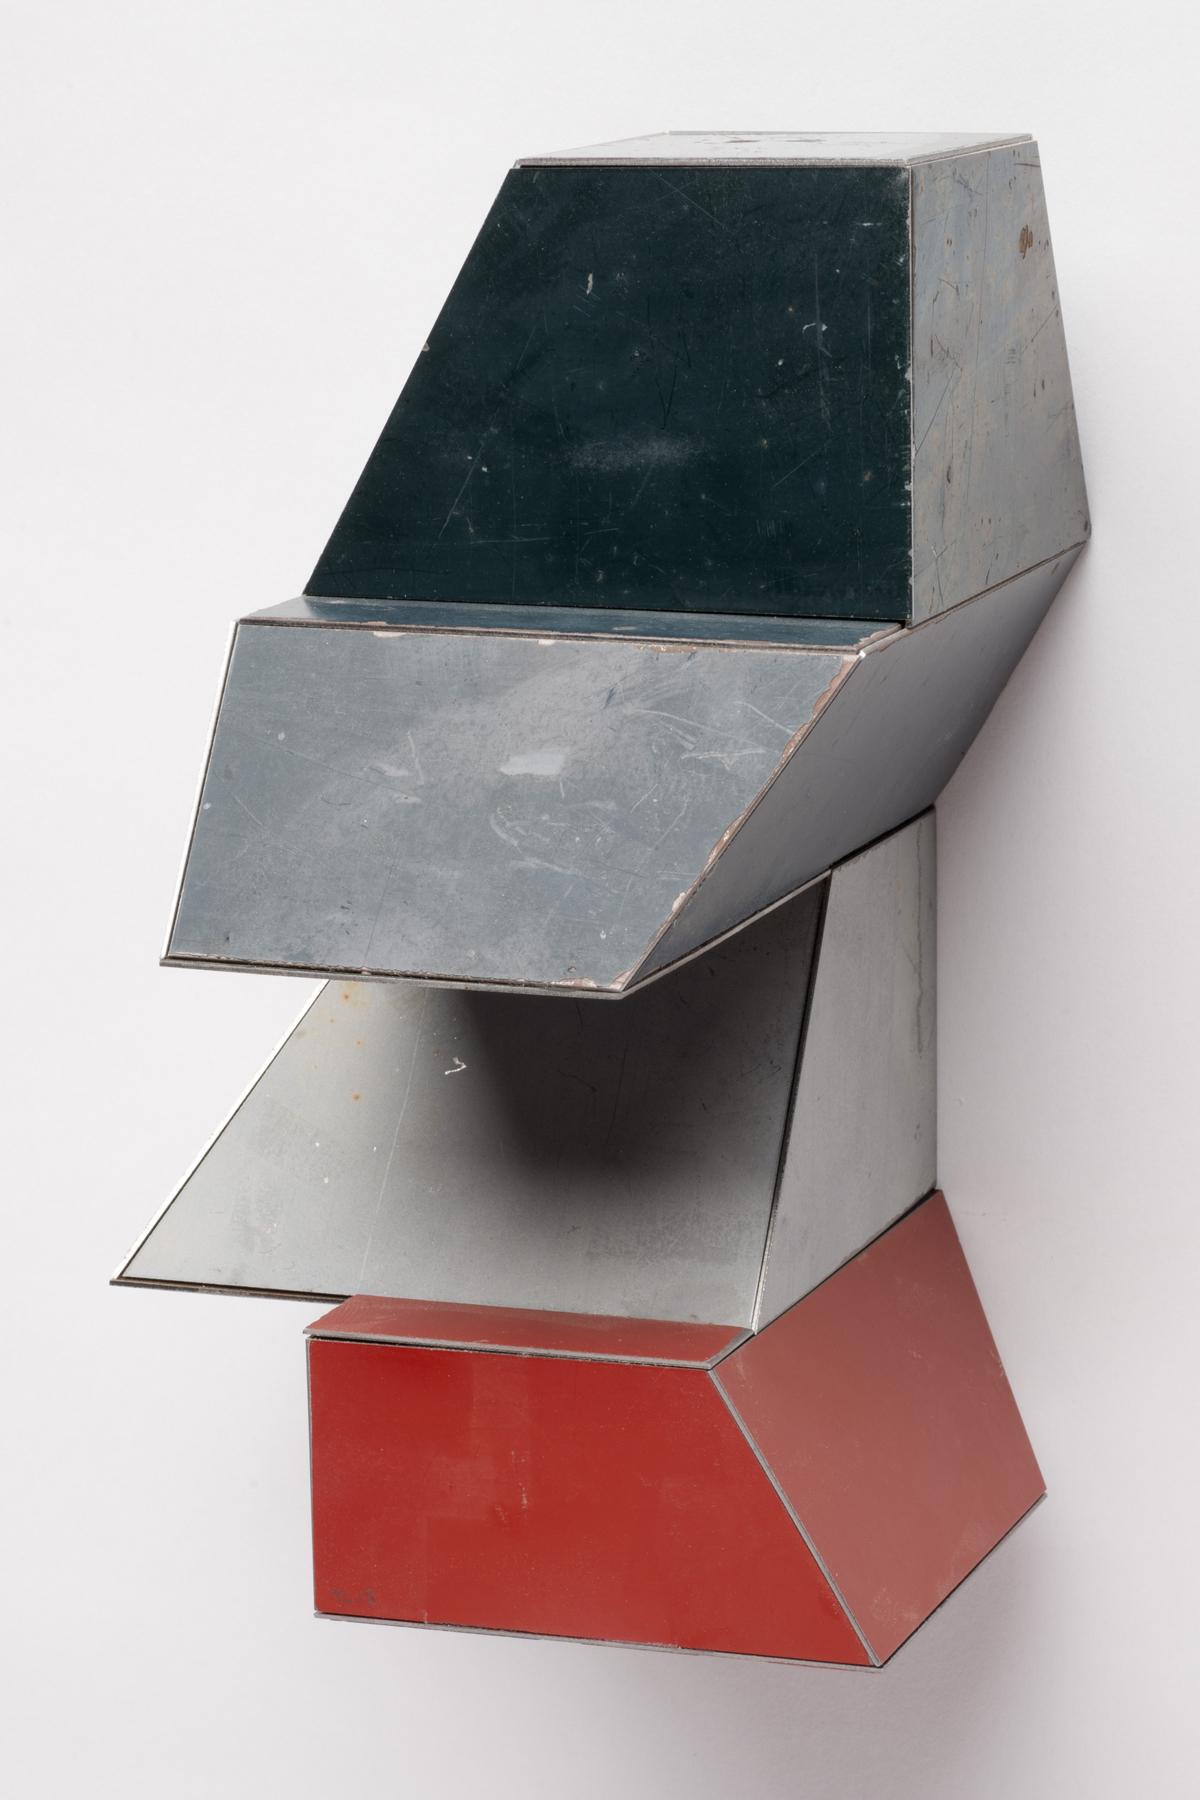 Mini Jumbo, 7.5 x 4.5 x 5 inches / 19 x 11.4 x 12.7 cm, salvage steel, marine-grade plywood, silicone, vulcanized rubber, hardware, 2018